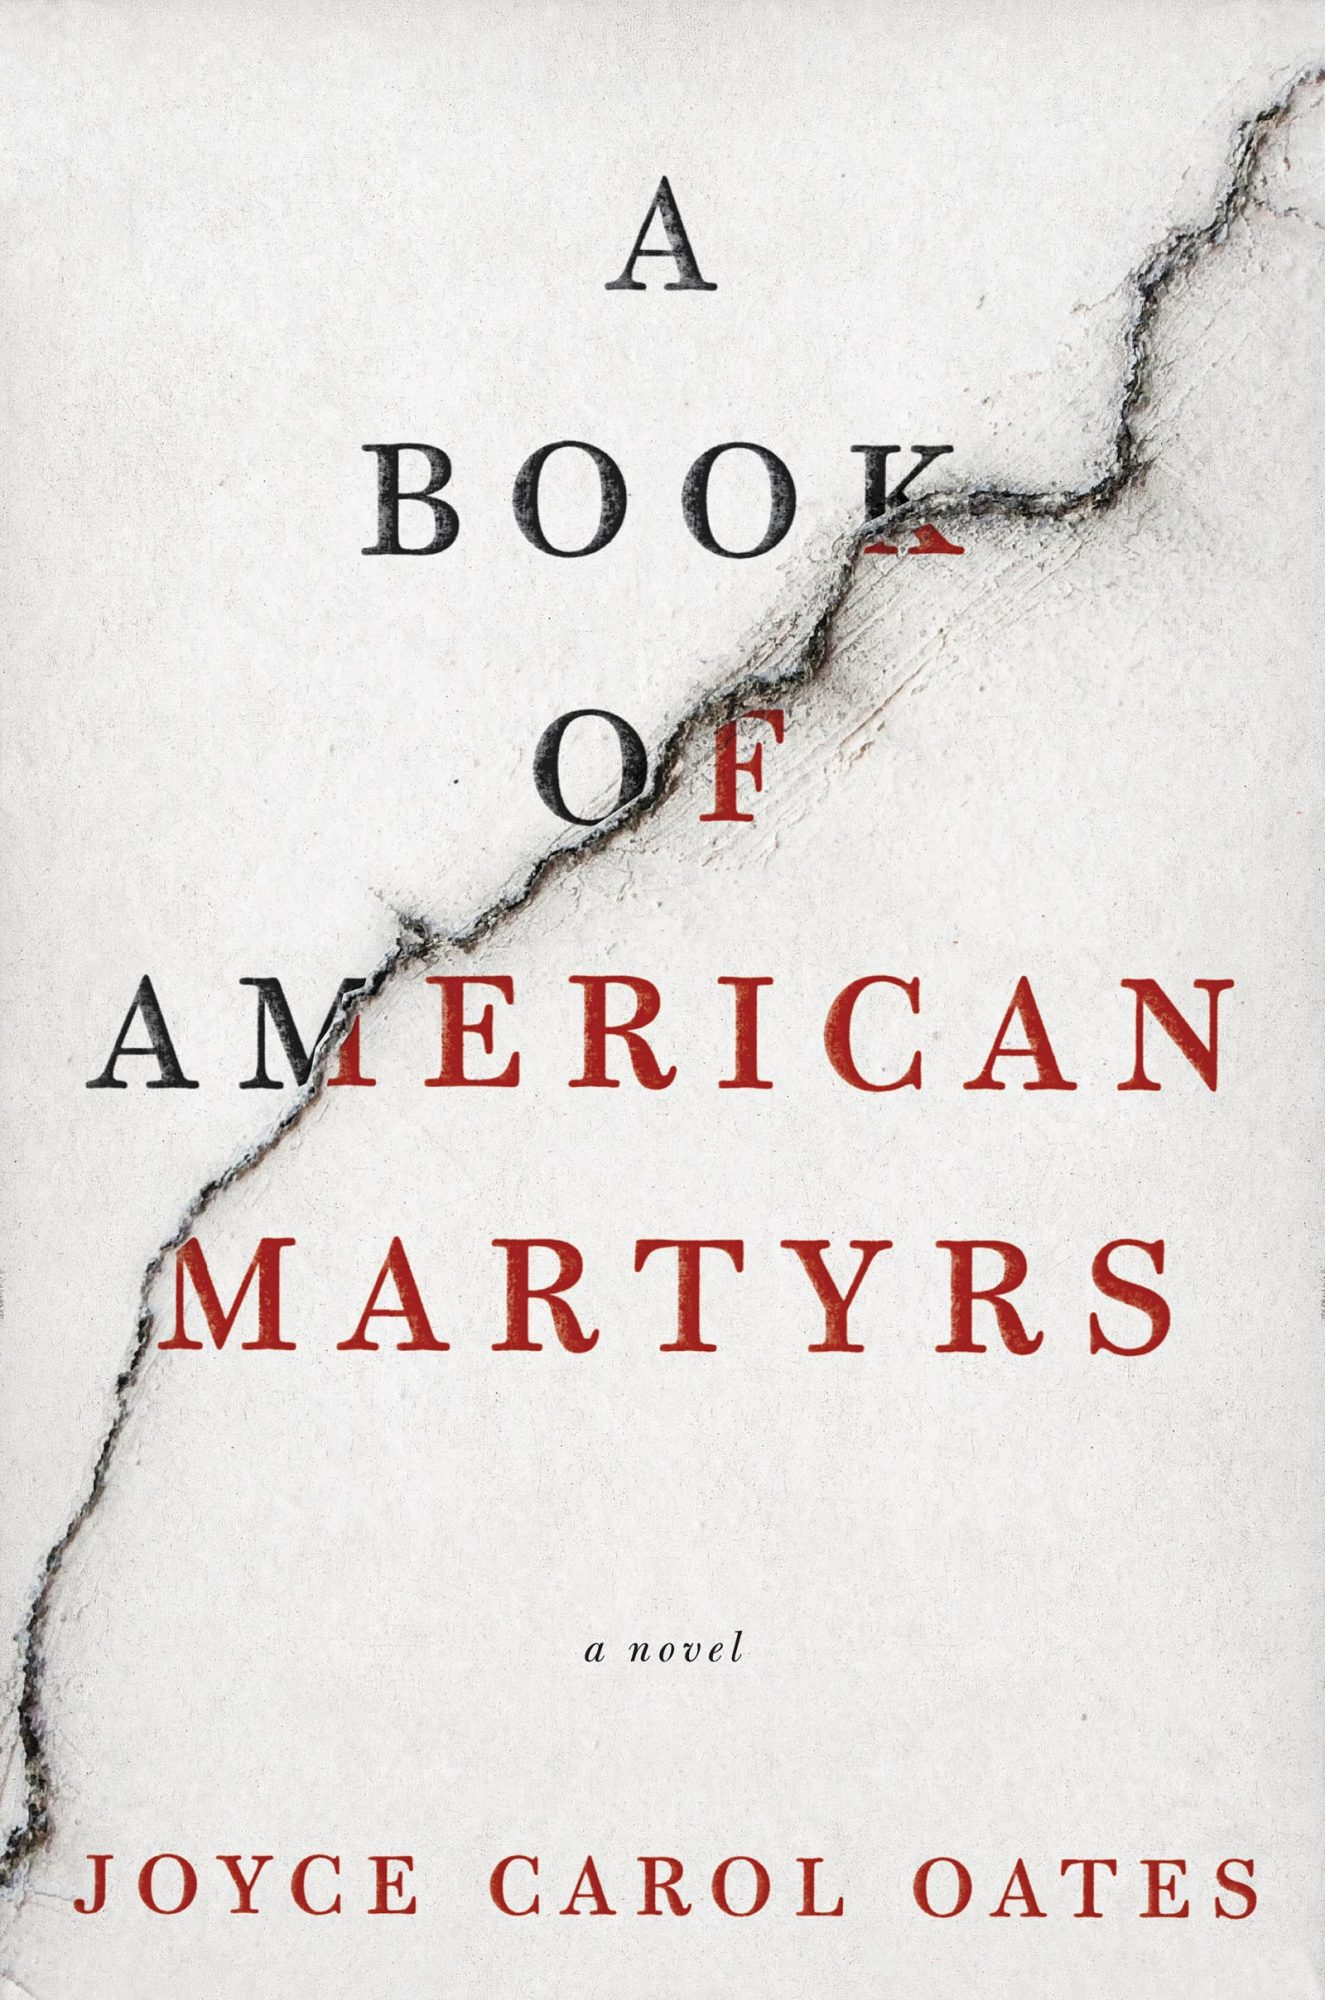 A Book of American Martyrs (2/7/2017)Joyce Carol Oates